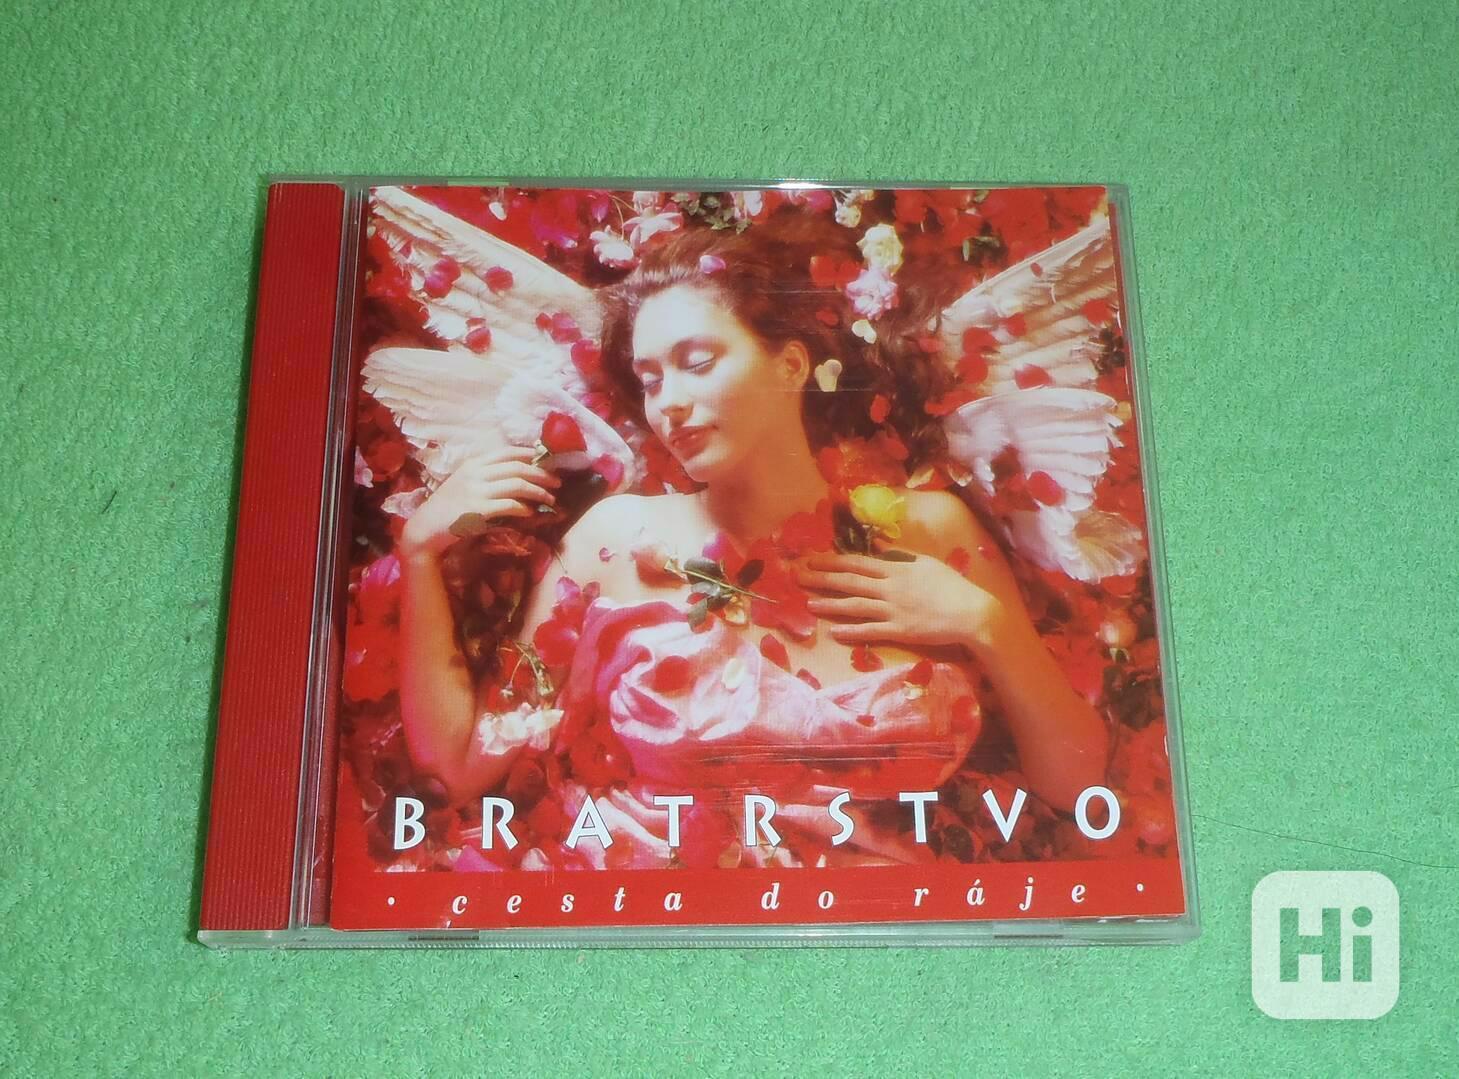 CD Bratrstvo - Cesta do ráje 1993 Jirásek RARE - foto 1